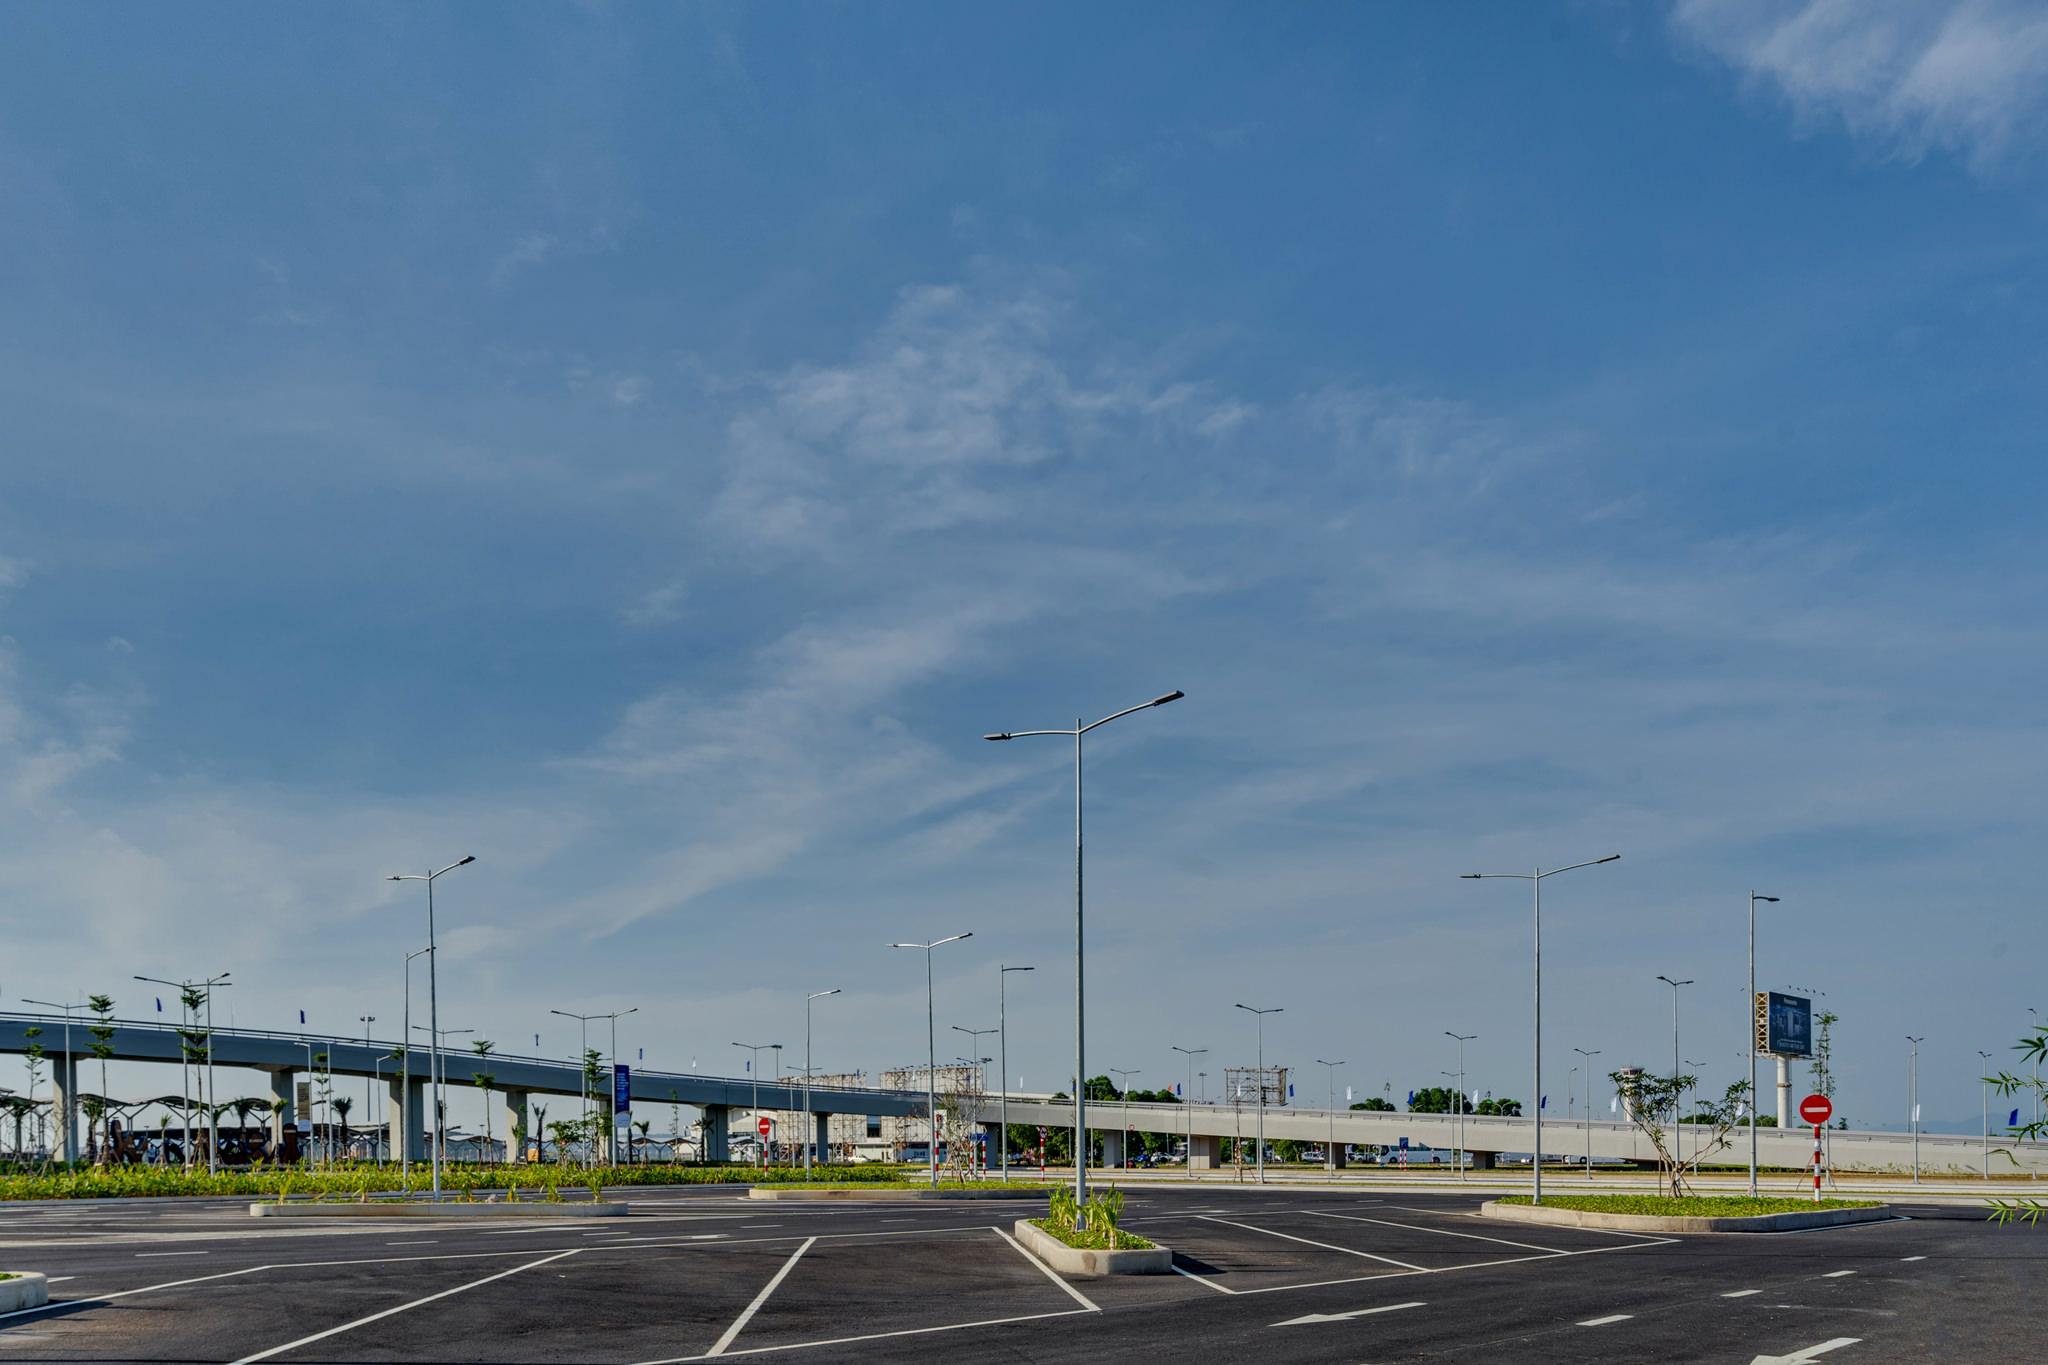 20180626 - Cam Ranh Airport - Architecture - 0240.jpg